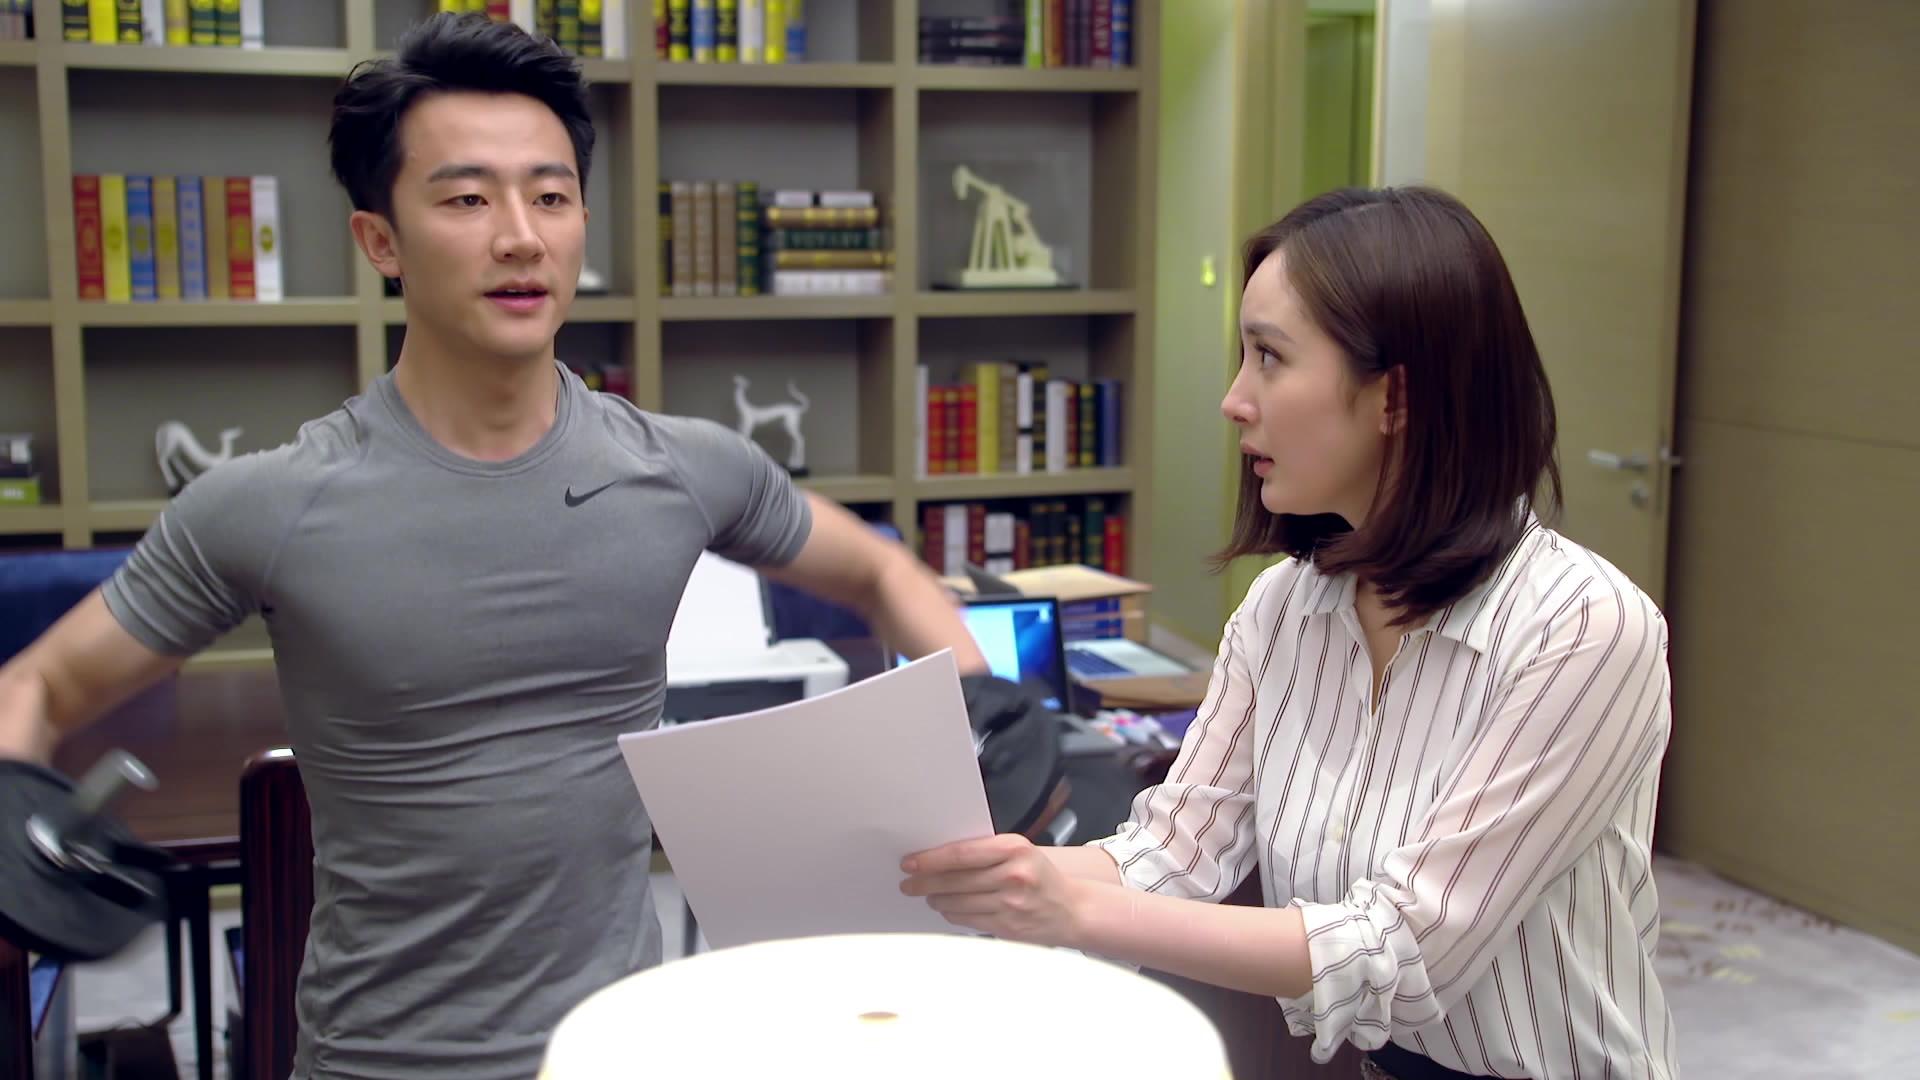 Huang Xuan's Muscles: The Interpreter